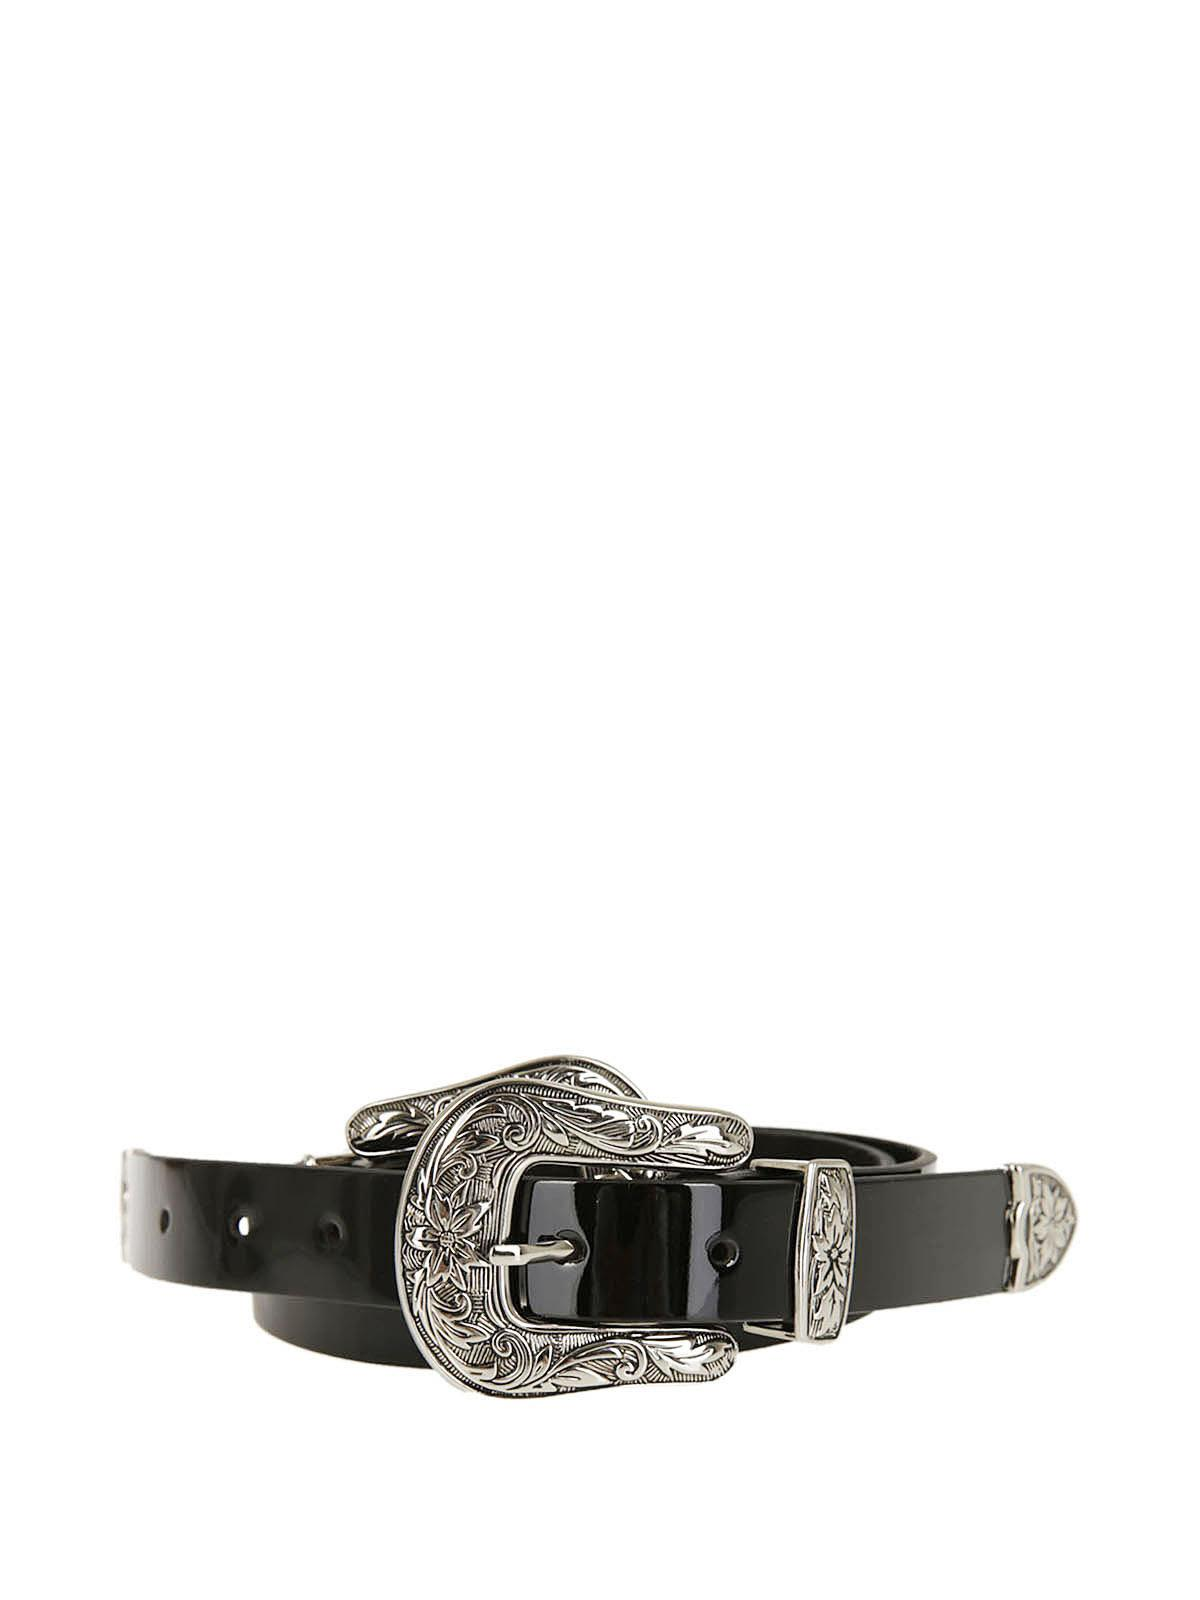 western double buckle belt - Red B-Low The Belt iyyXK4XD